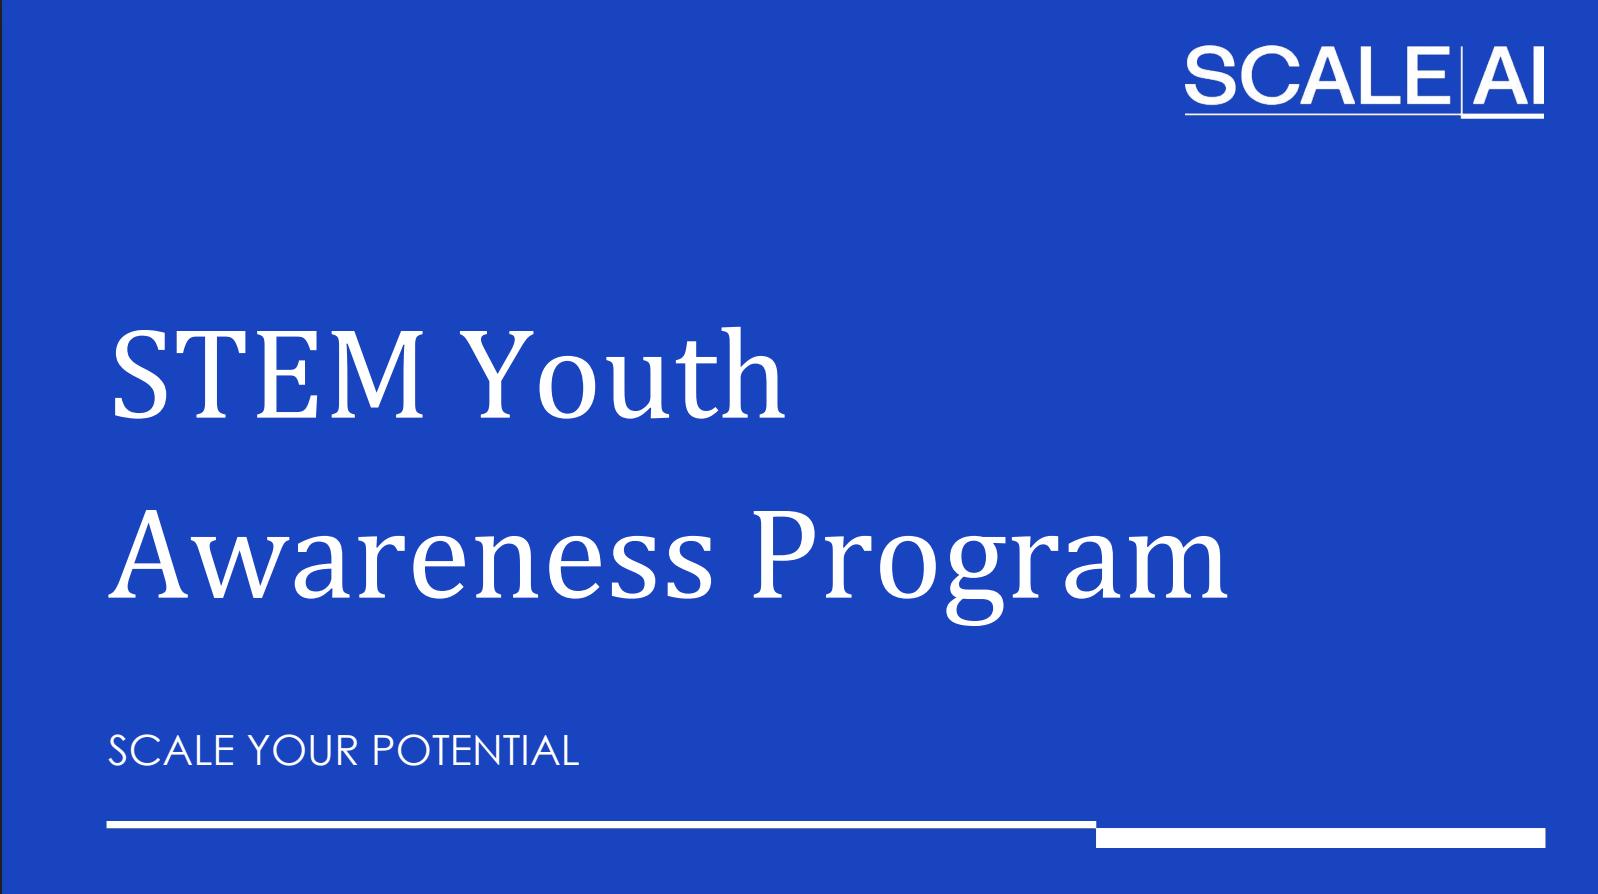 STEM Youth Awareness Program - Video